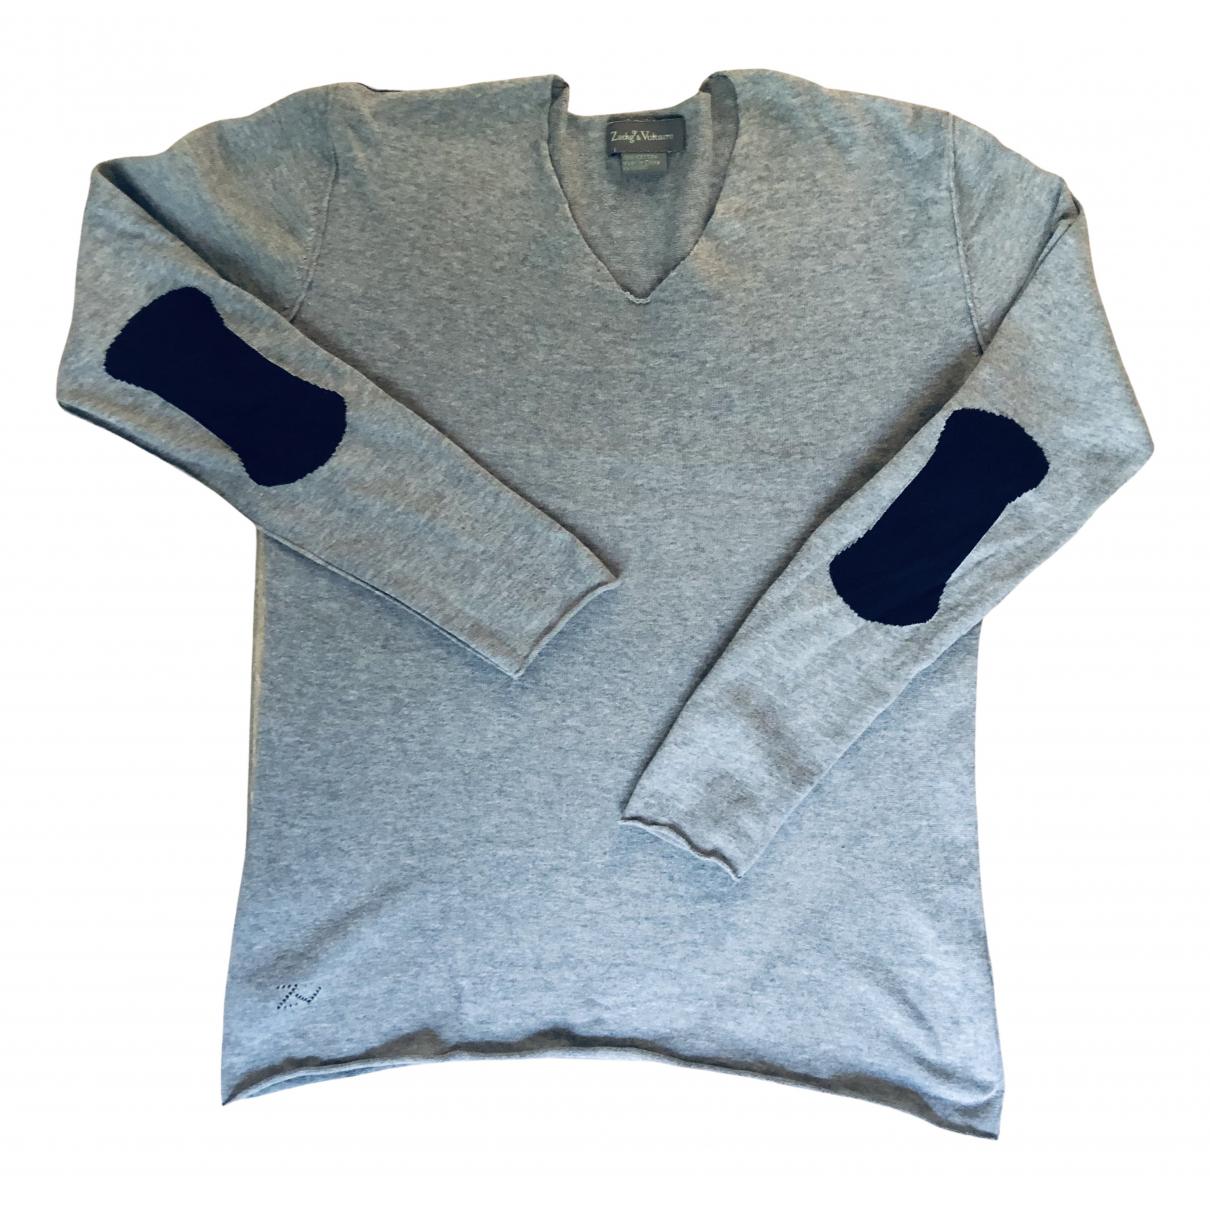 Zadig & Voltaire Fall Winter 2019 Pullover.Westen.Sweatshirts  in  Grau Baumwolle